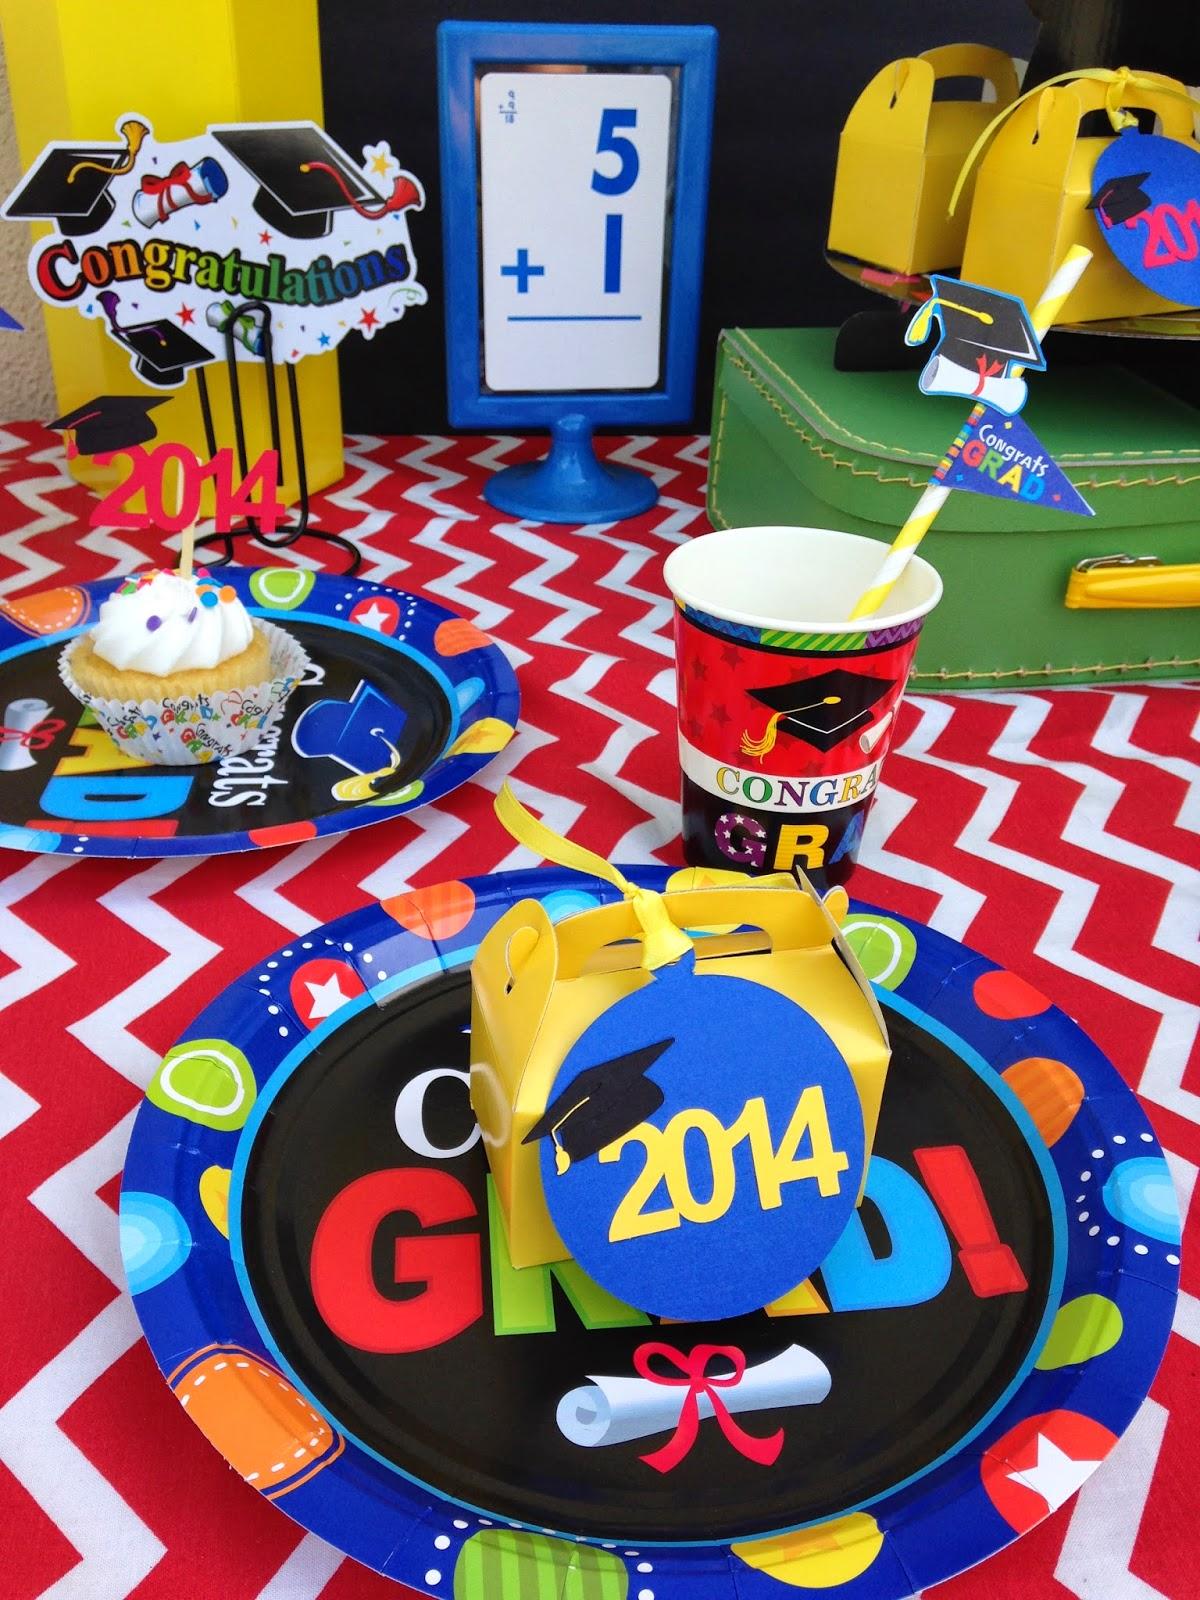 Kinder Garden: Pre-School/Kindergarten Graduation Party Ideas